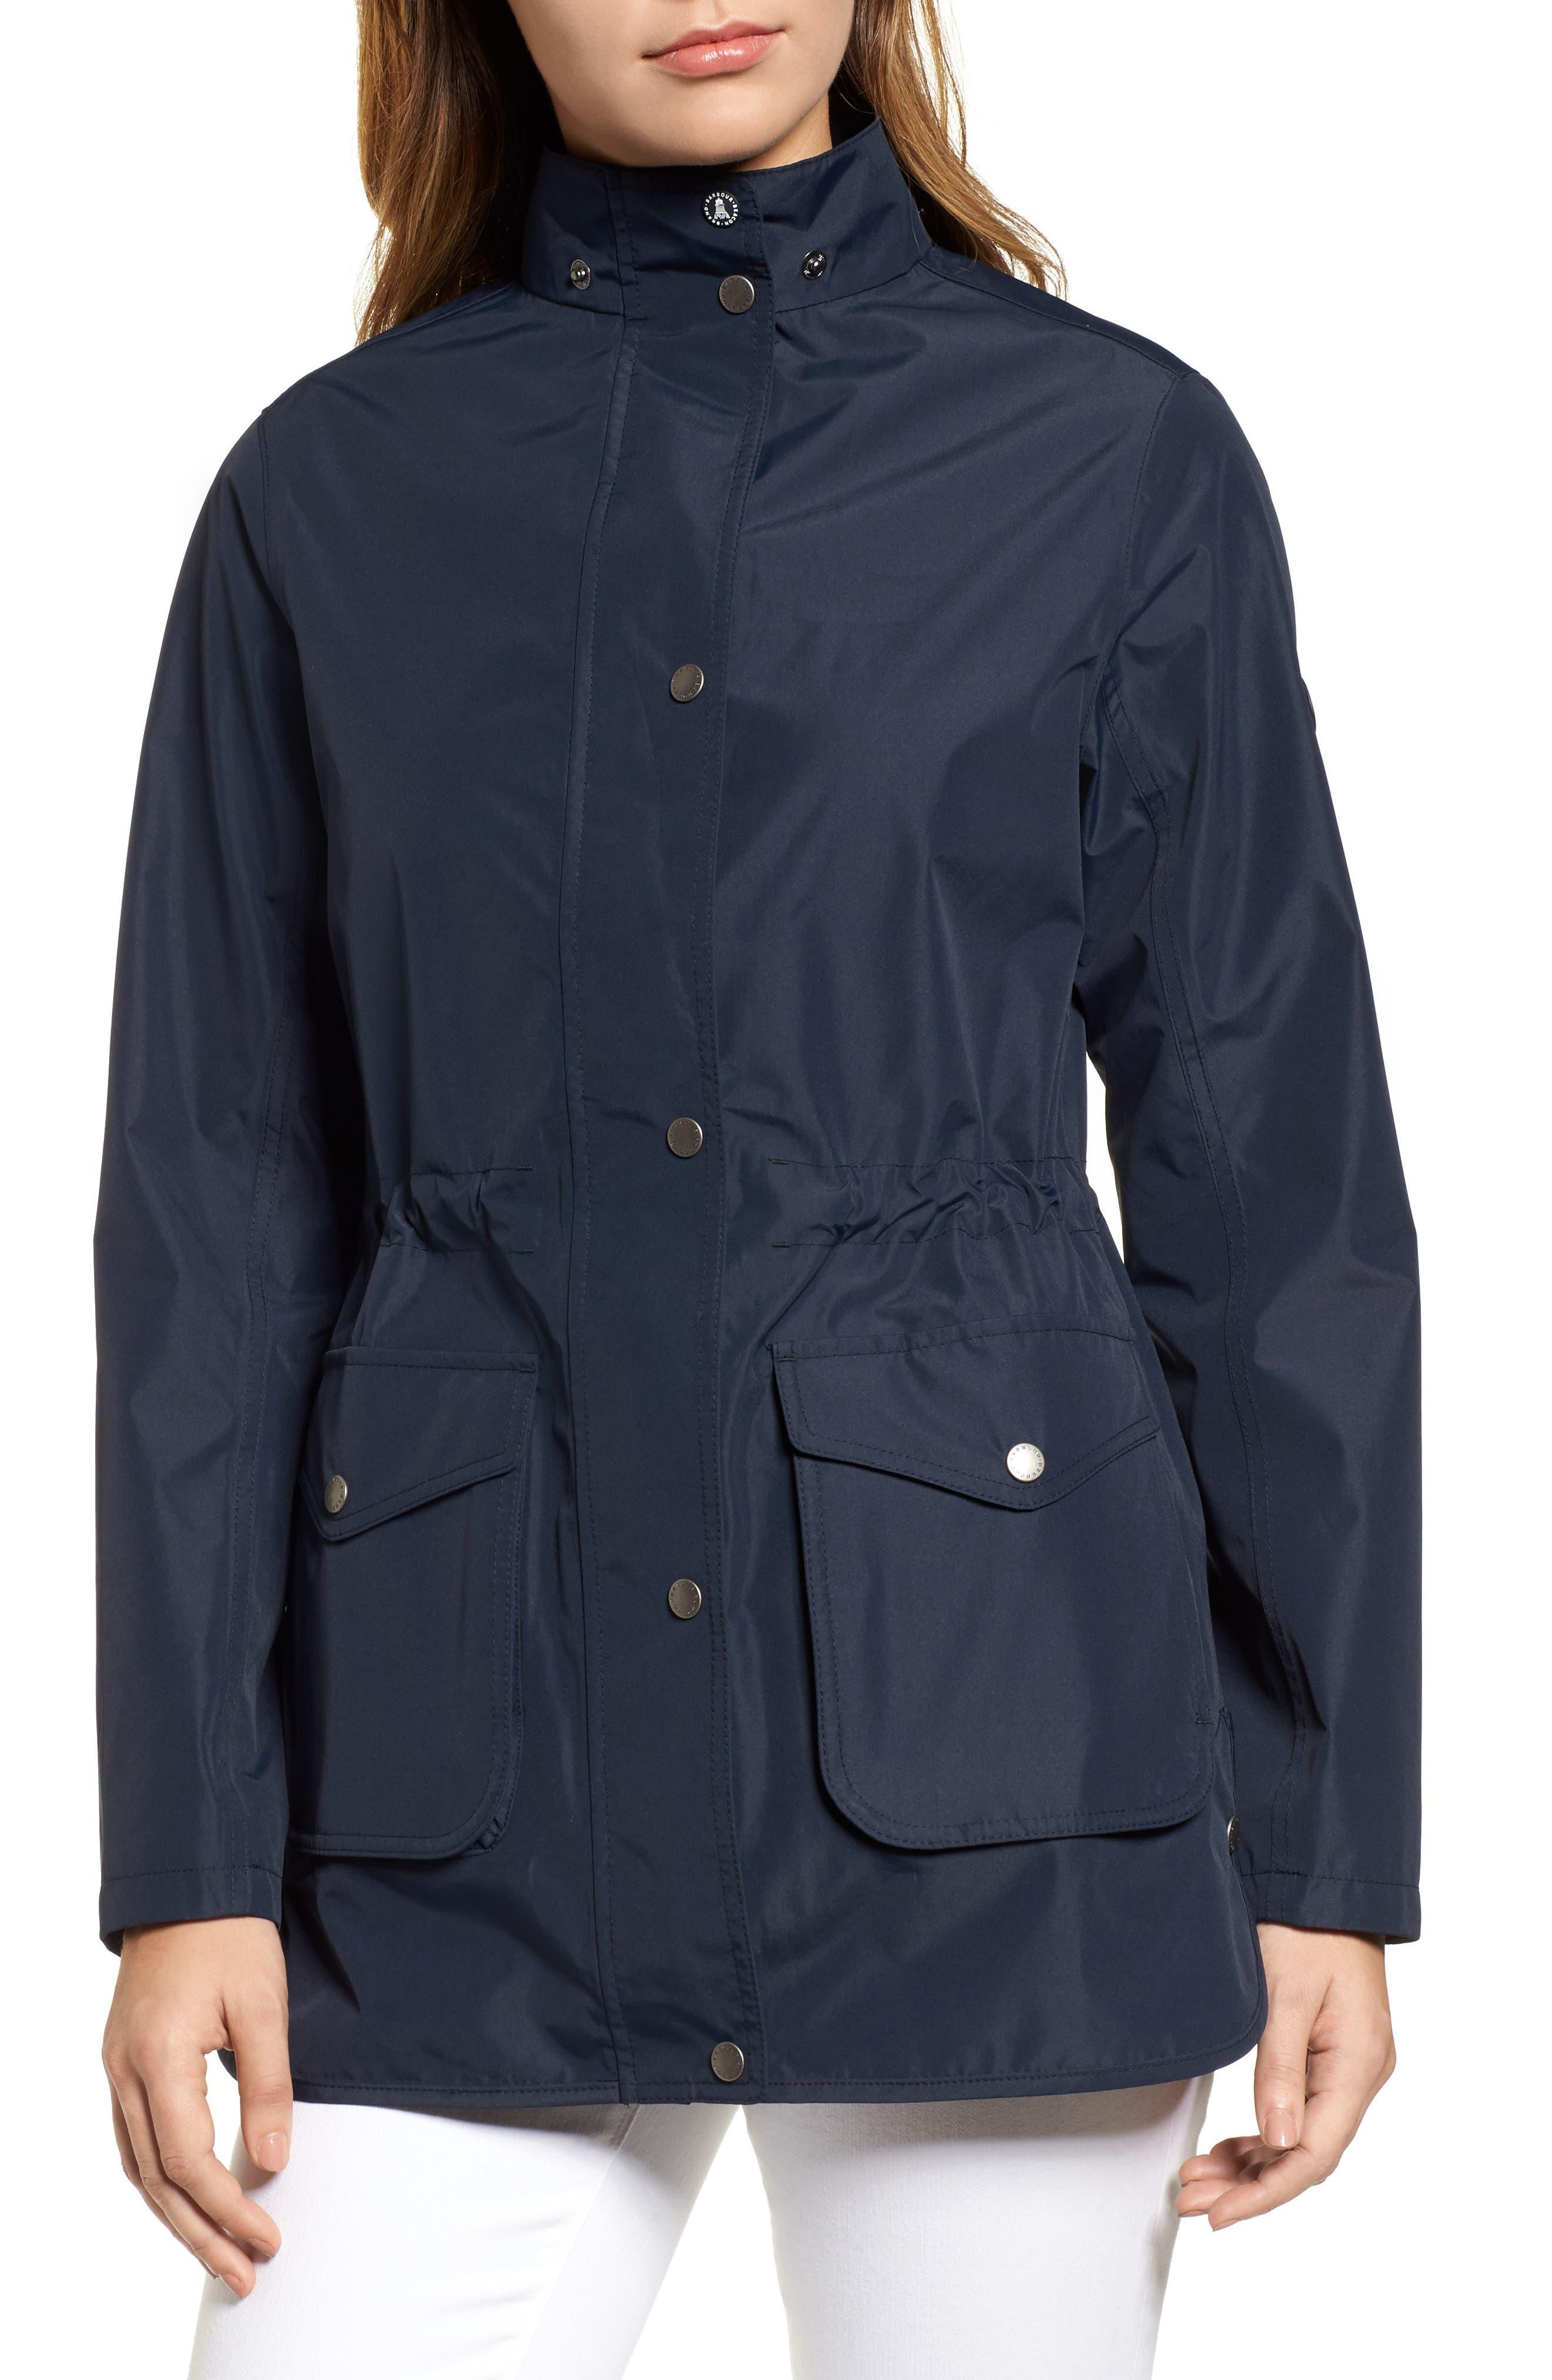 Studland Waterproof Jacket,                             Alternate thumbnail 4, color,                             Navy